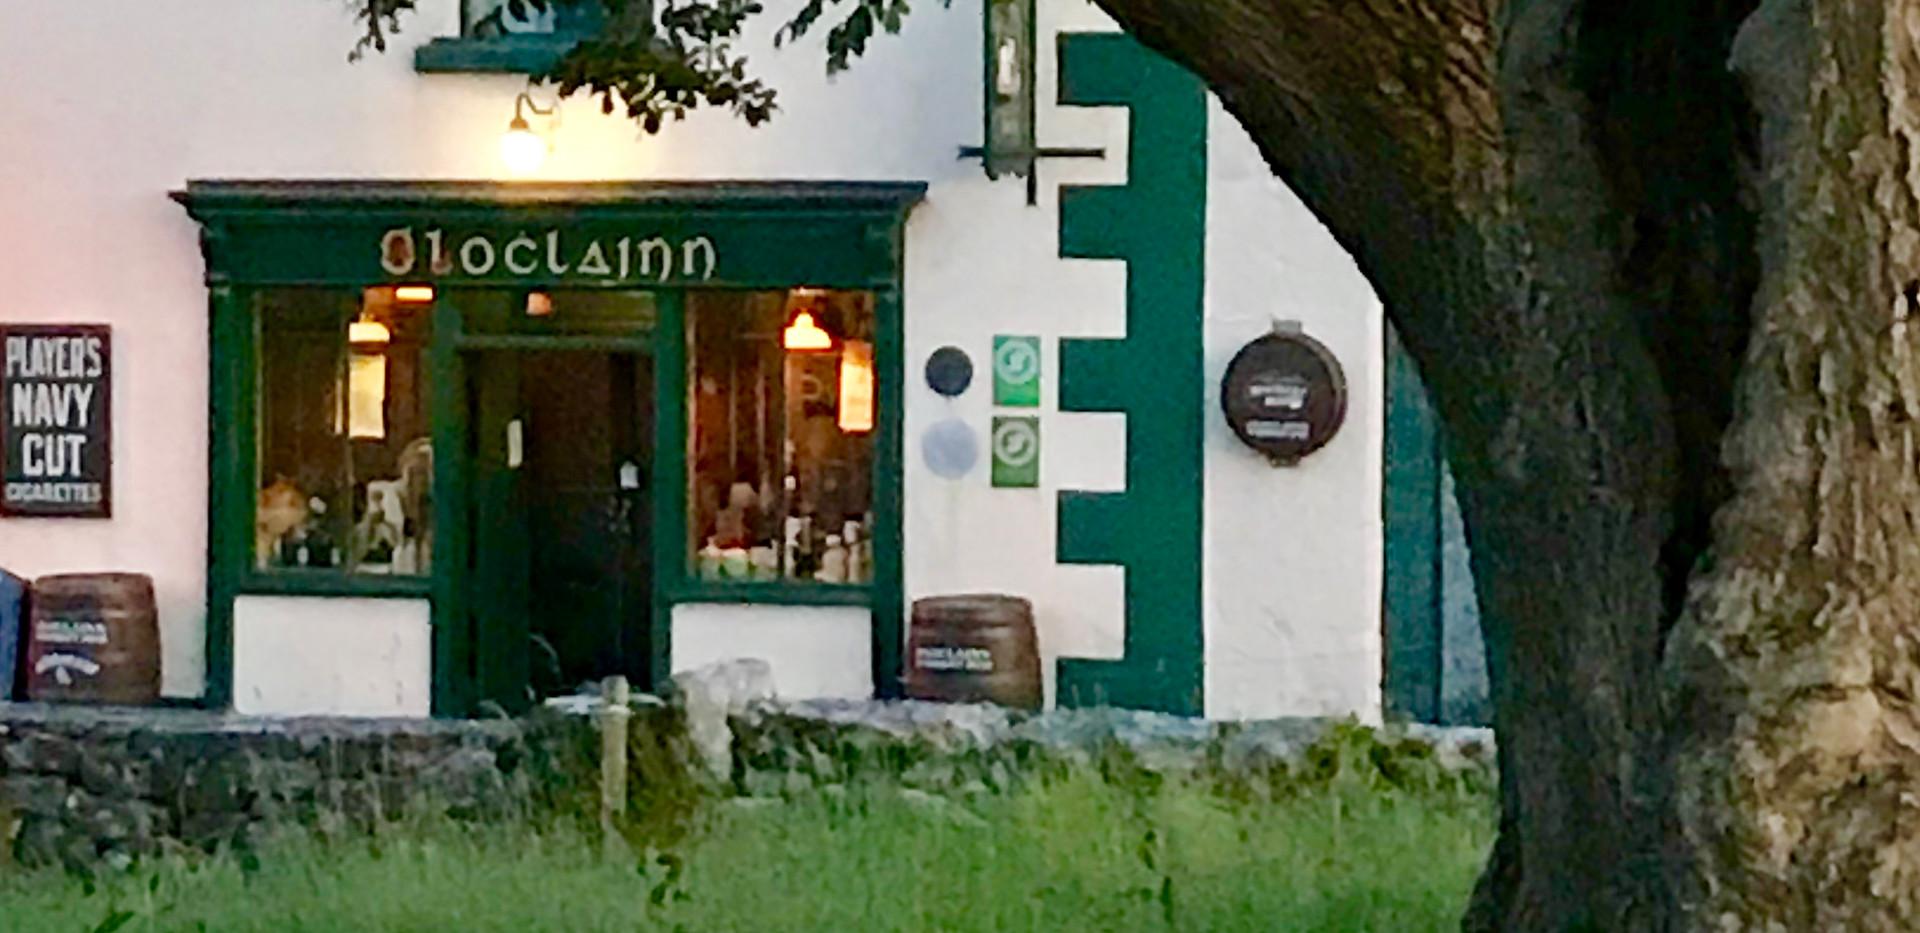 O'Loclainn's Whiskey Bar, Ballyvaughan, Co. Clare, Traditional Irish Pub